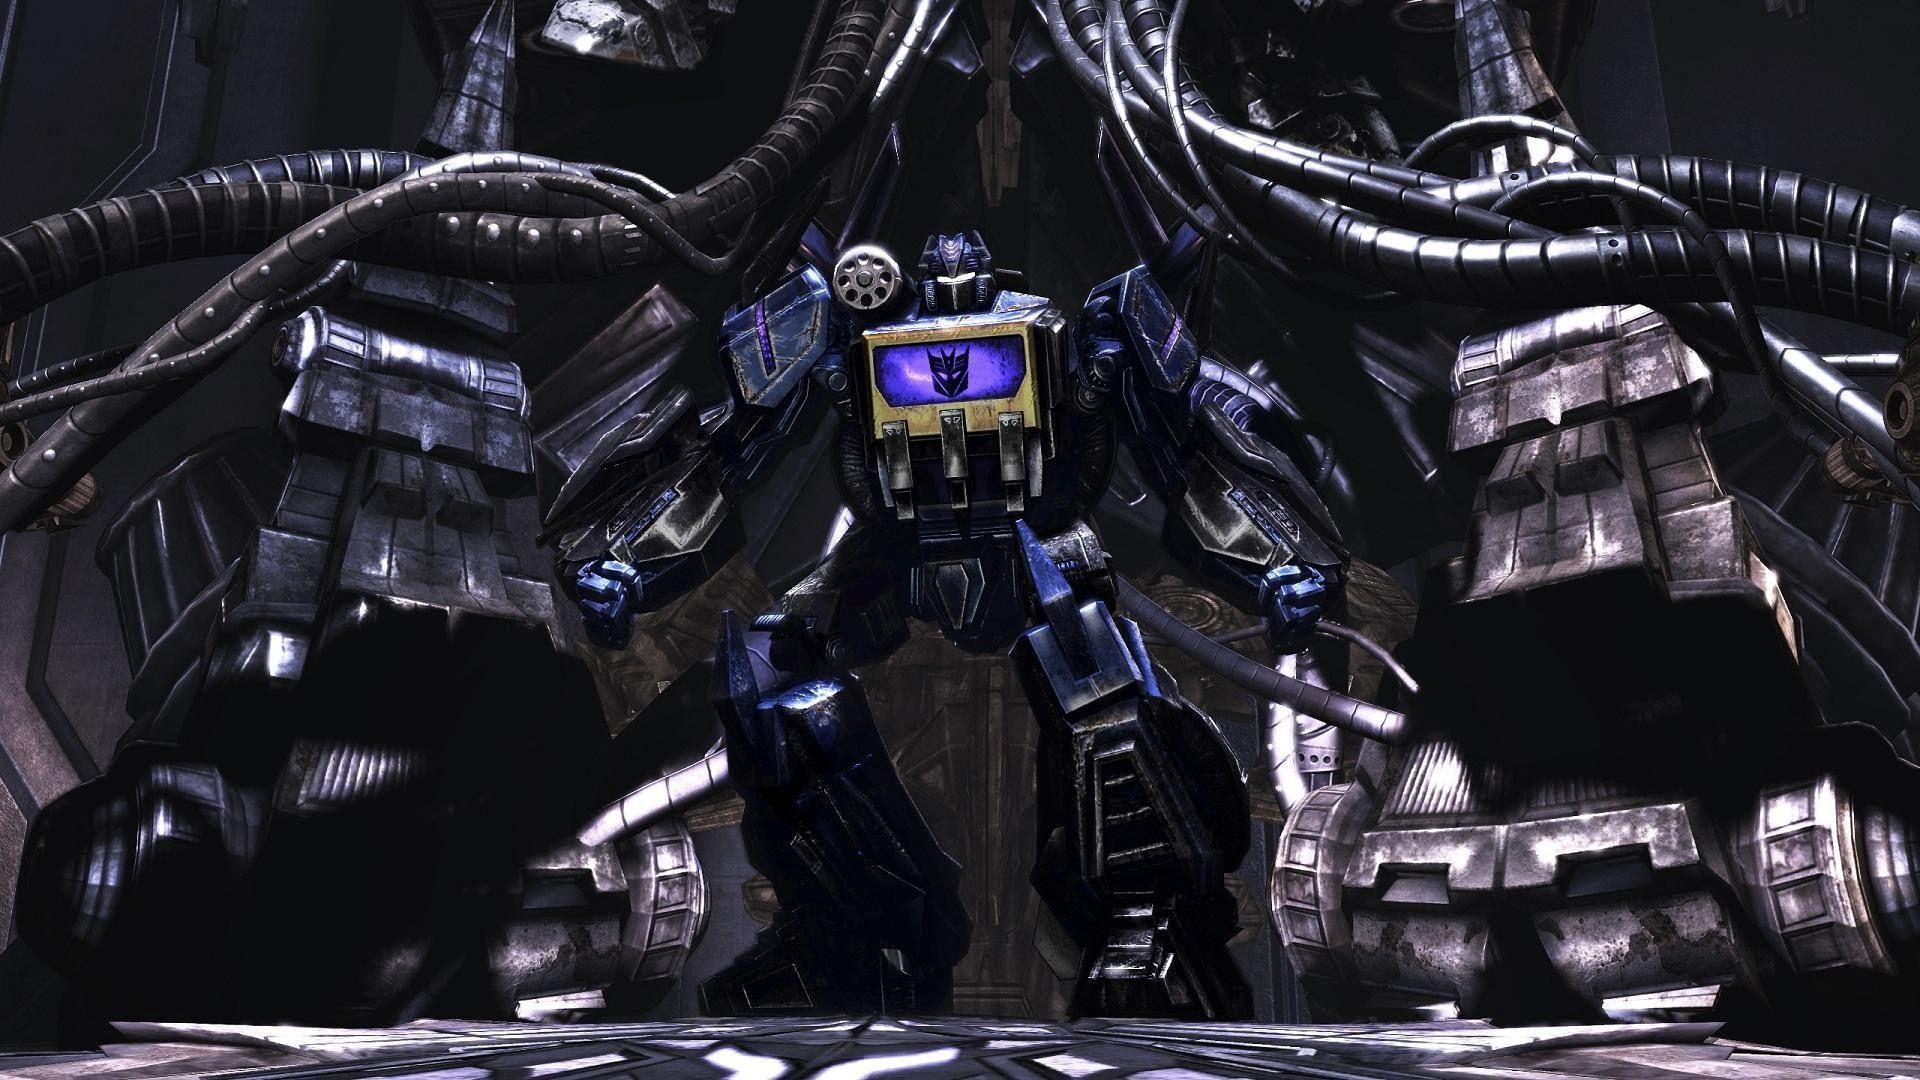 Transformers Soundwave Wallpaper 64 Images